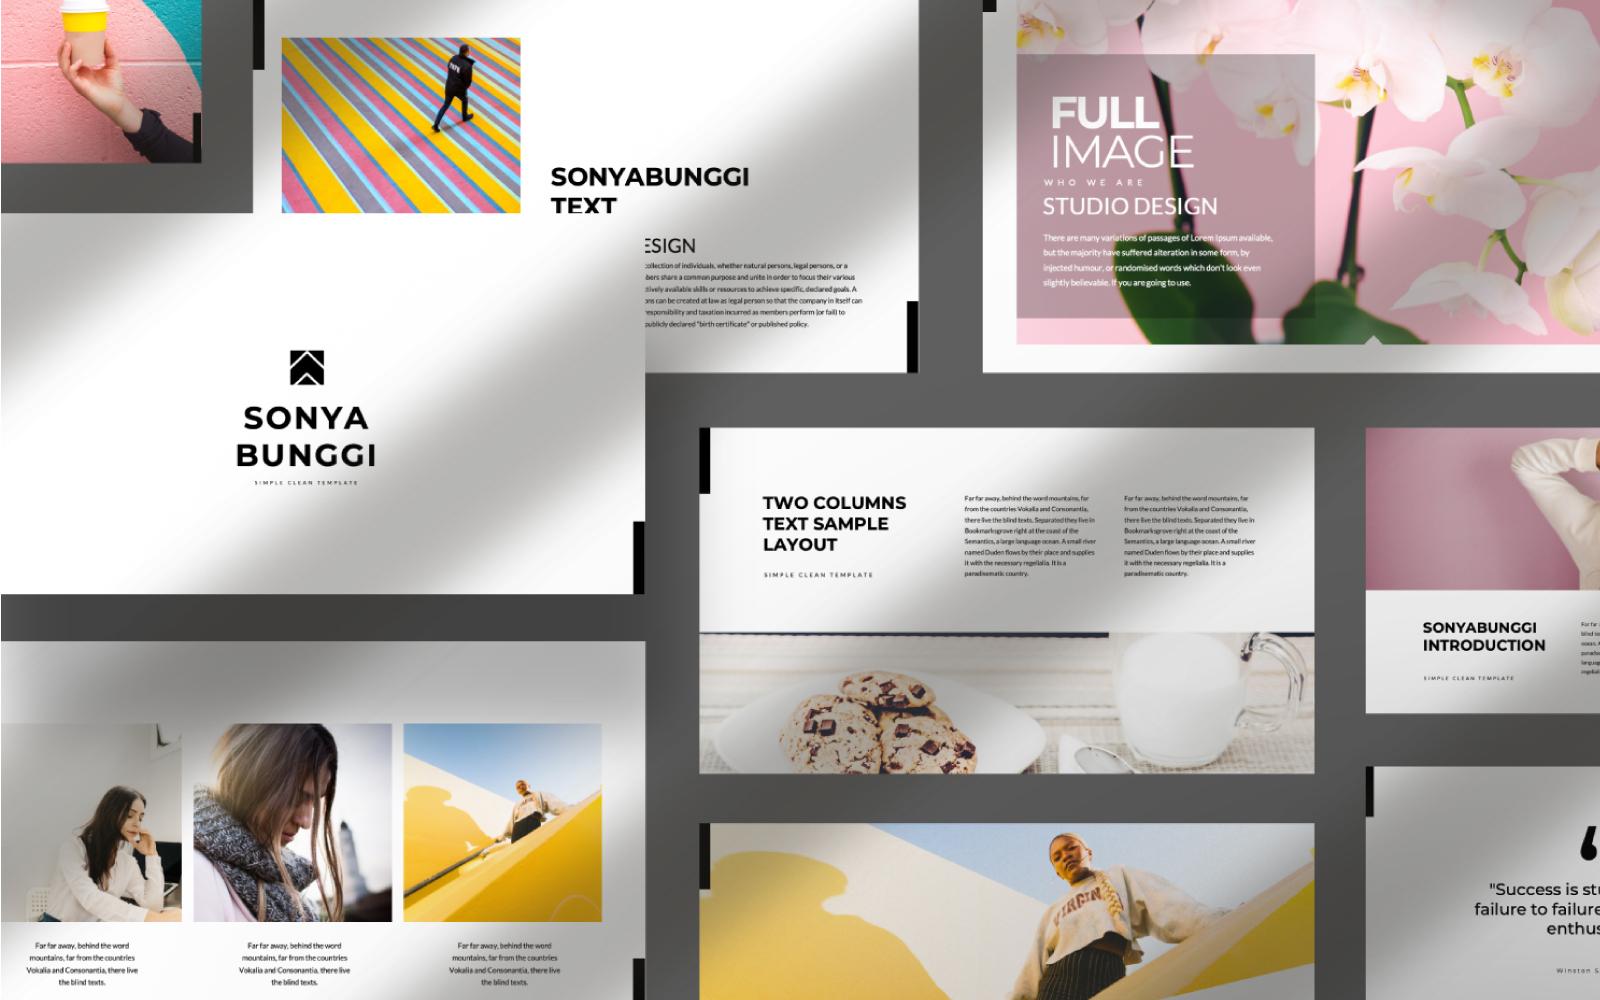 Sonya Bunggi Presentation PowerPoint Template